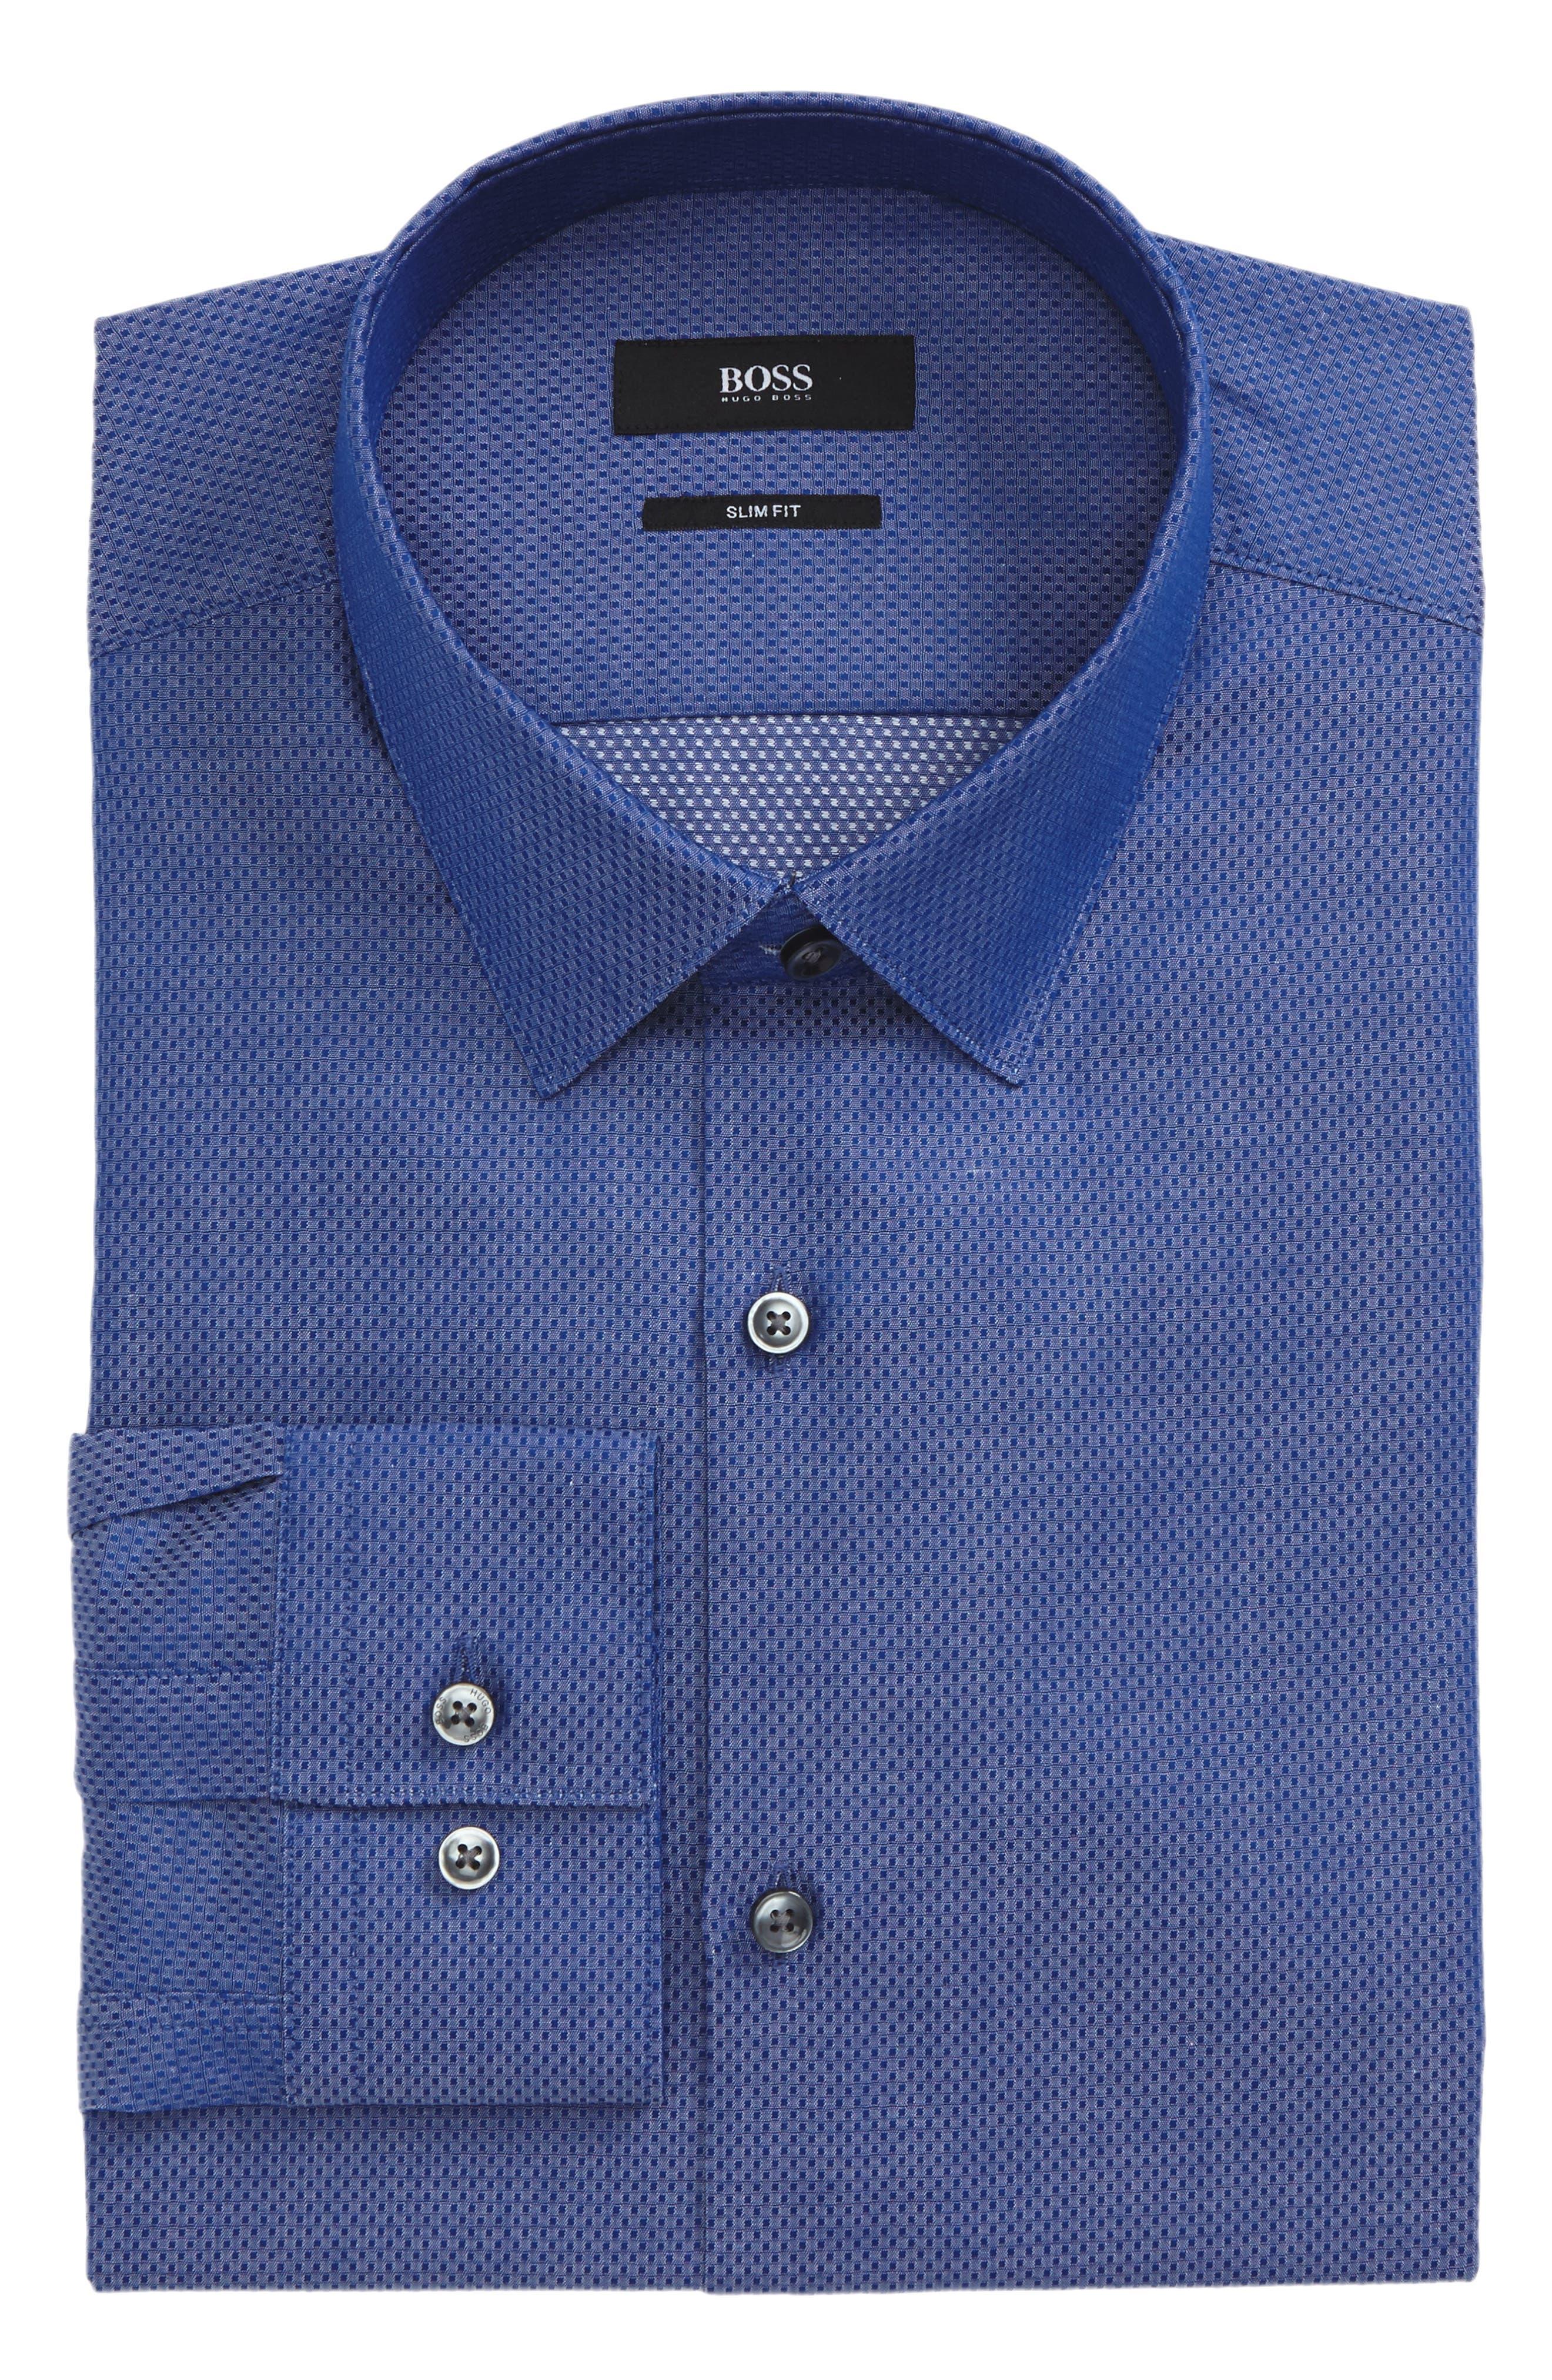 Isko Slim Fit Textured Dress Shirt,                             Main thumbnail 1, color,                             421